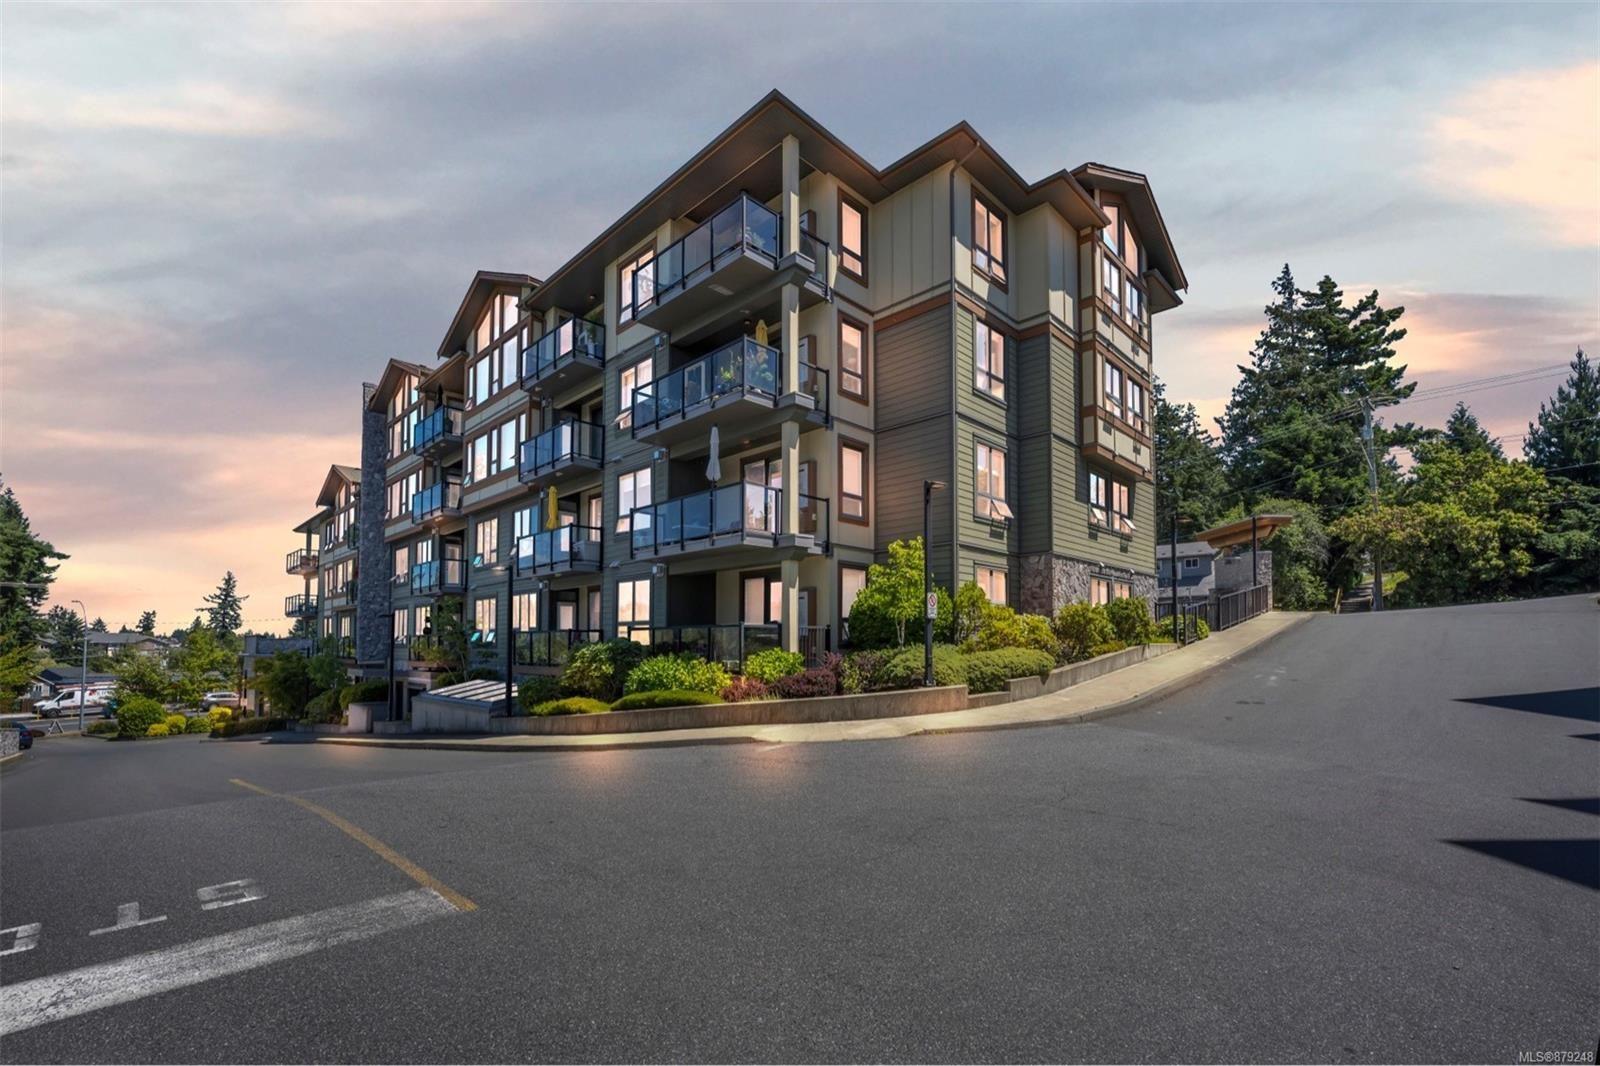 Main Photo: 205 3210 Jacklin Rd in : La Glen Lake Condo for sale (Langford)  : MLS®# 879248